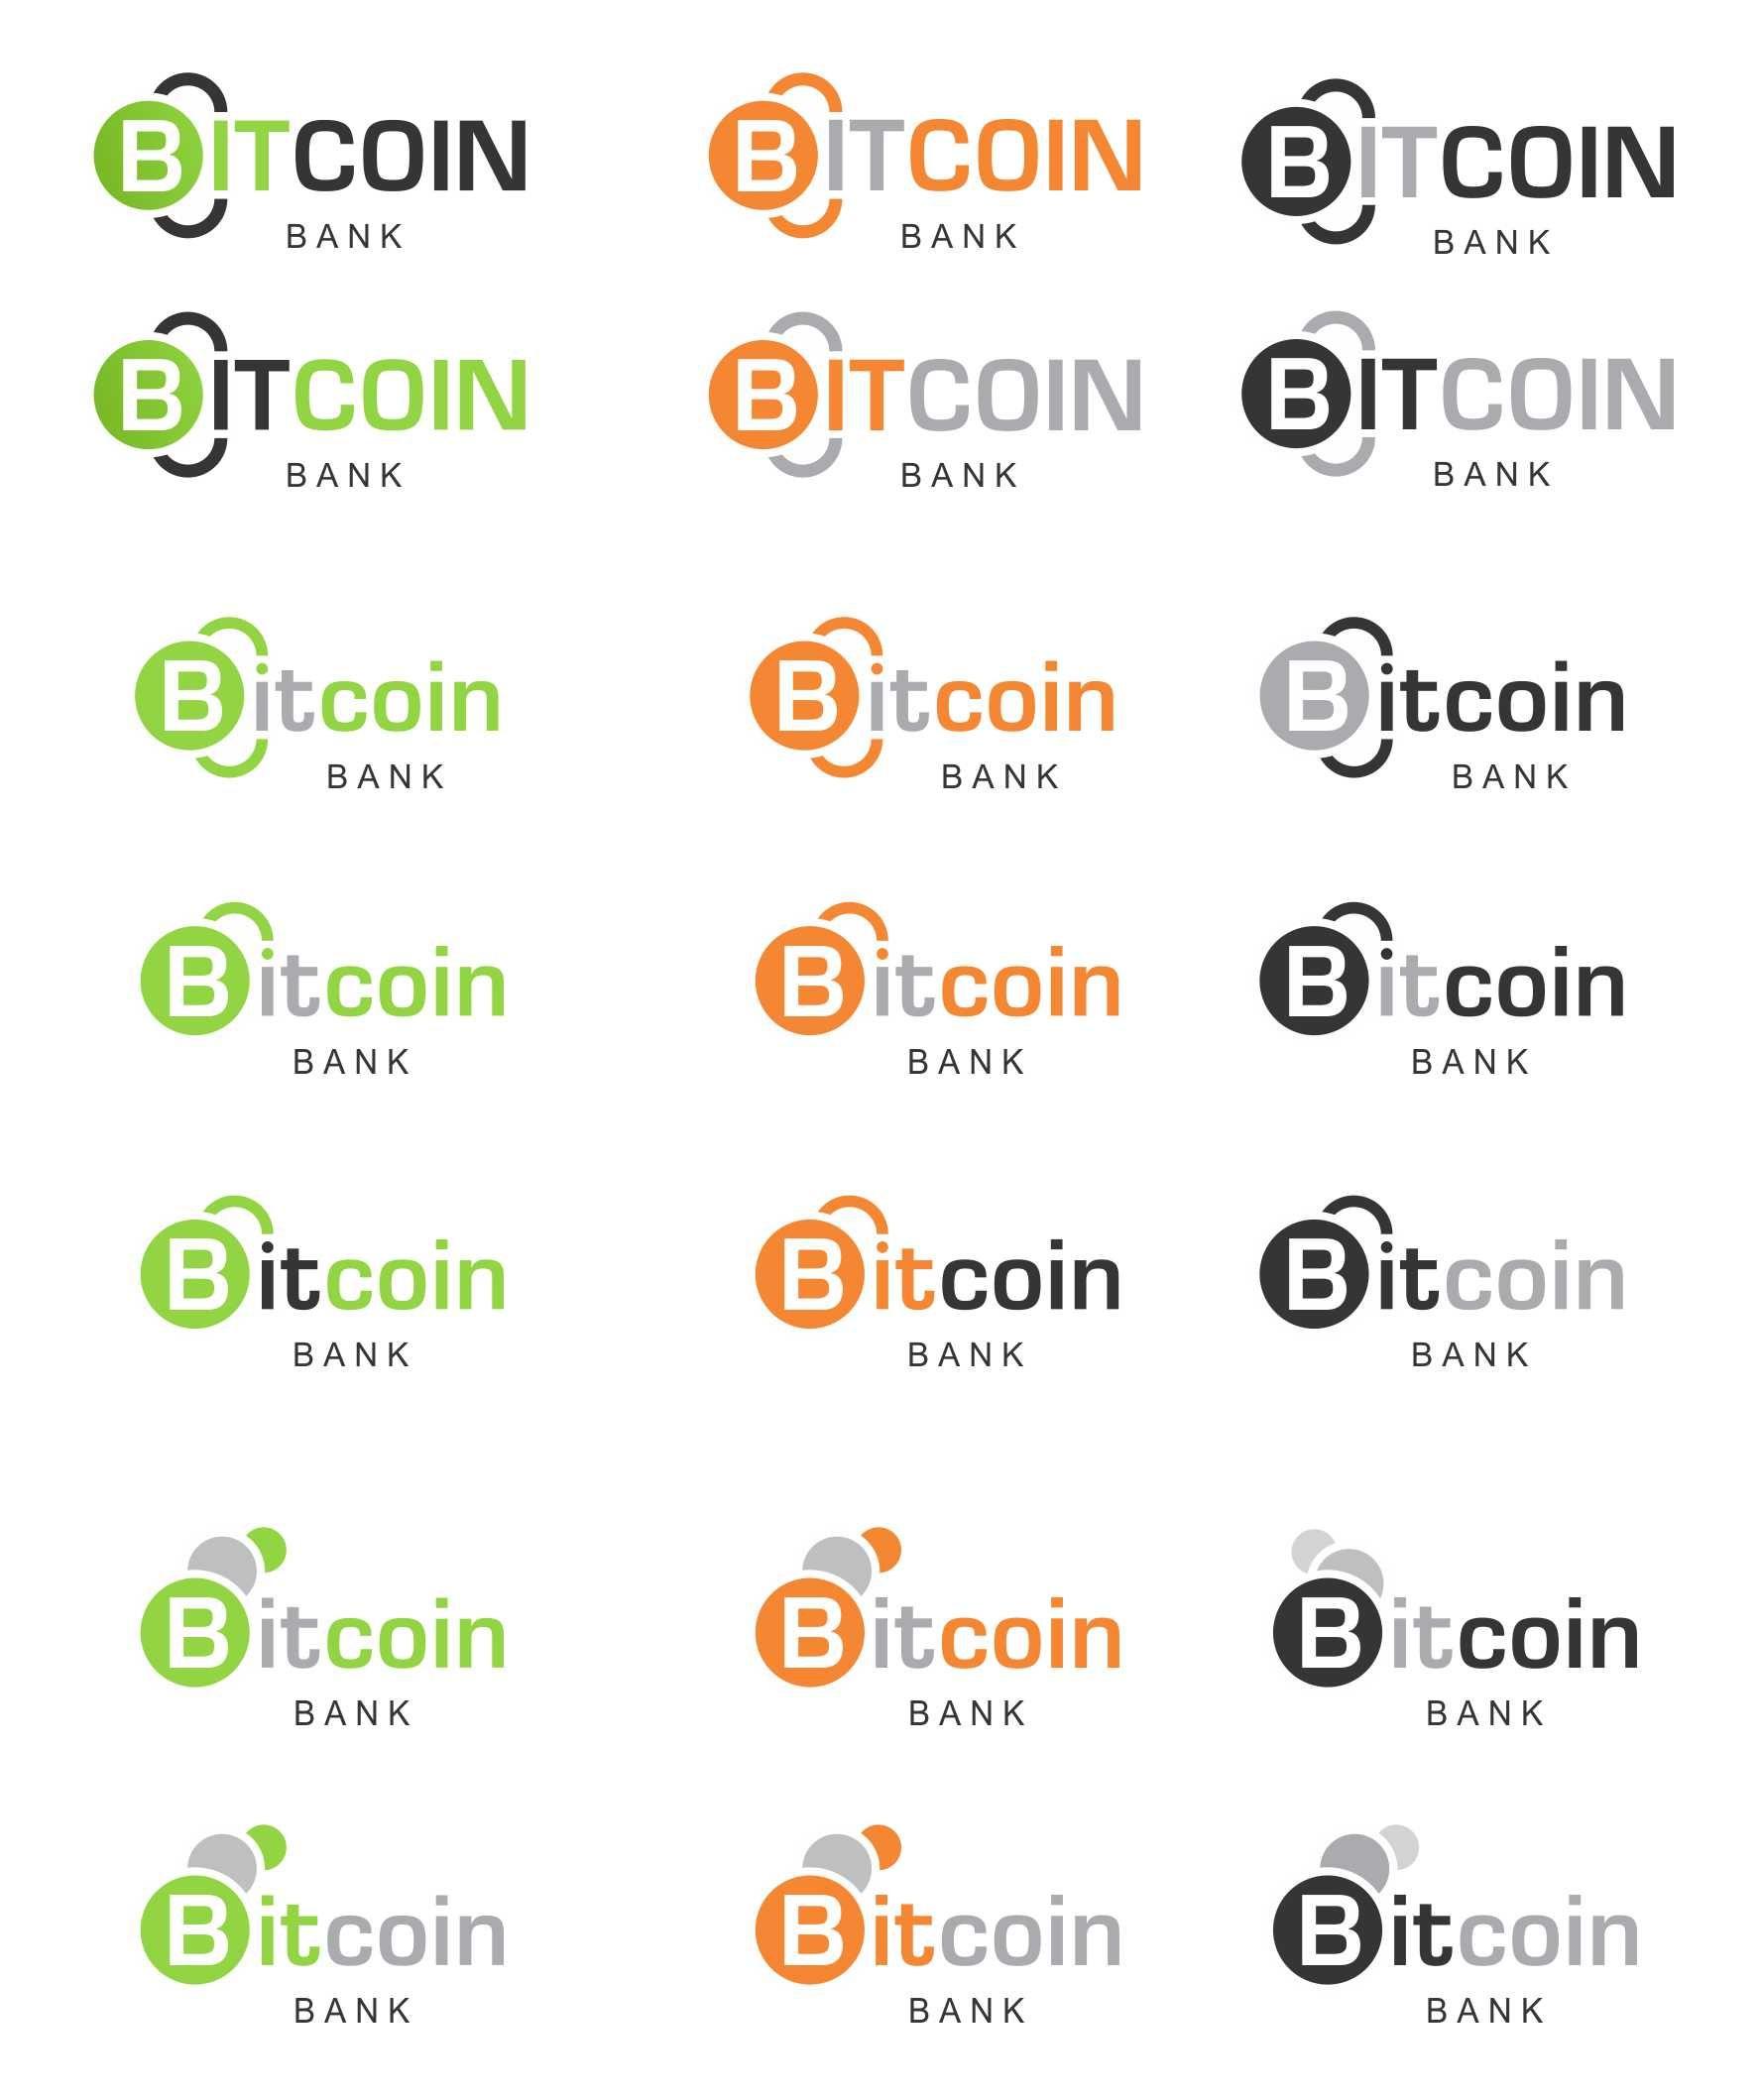 BitcoinBank - Логотип - дизайнер KBSH